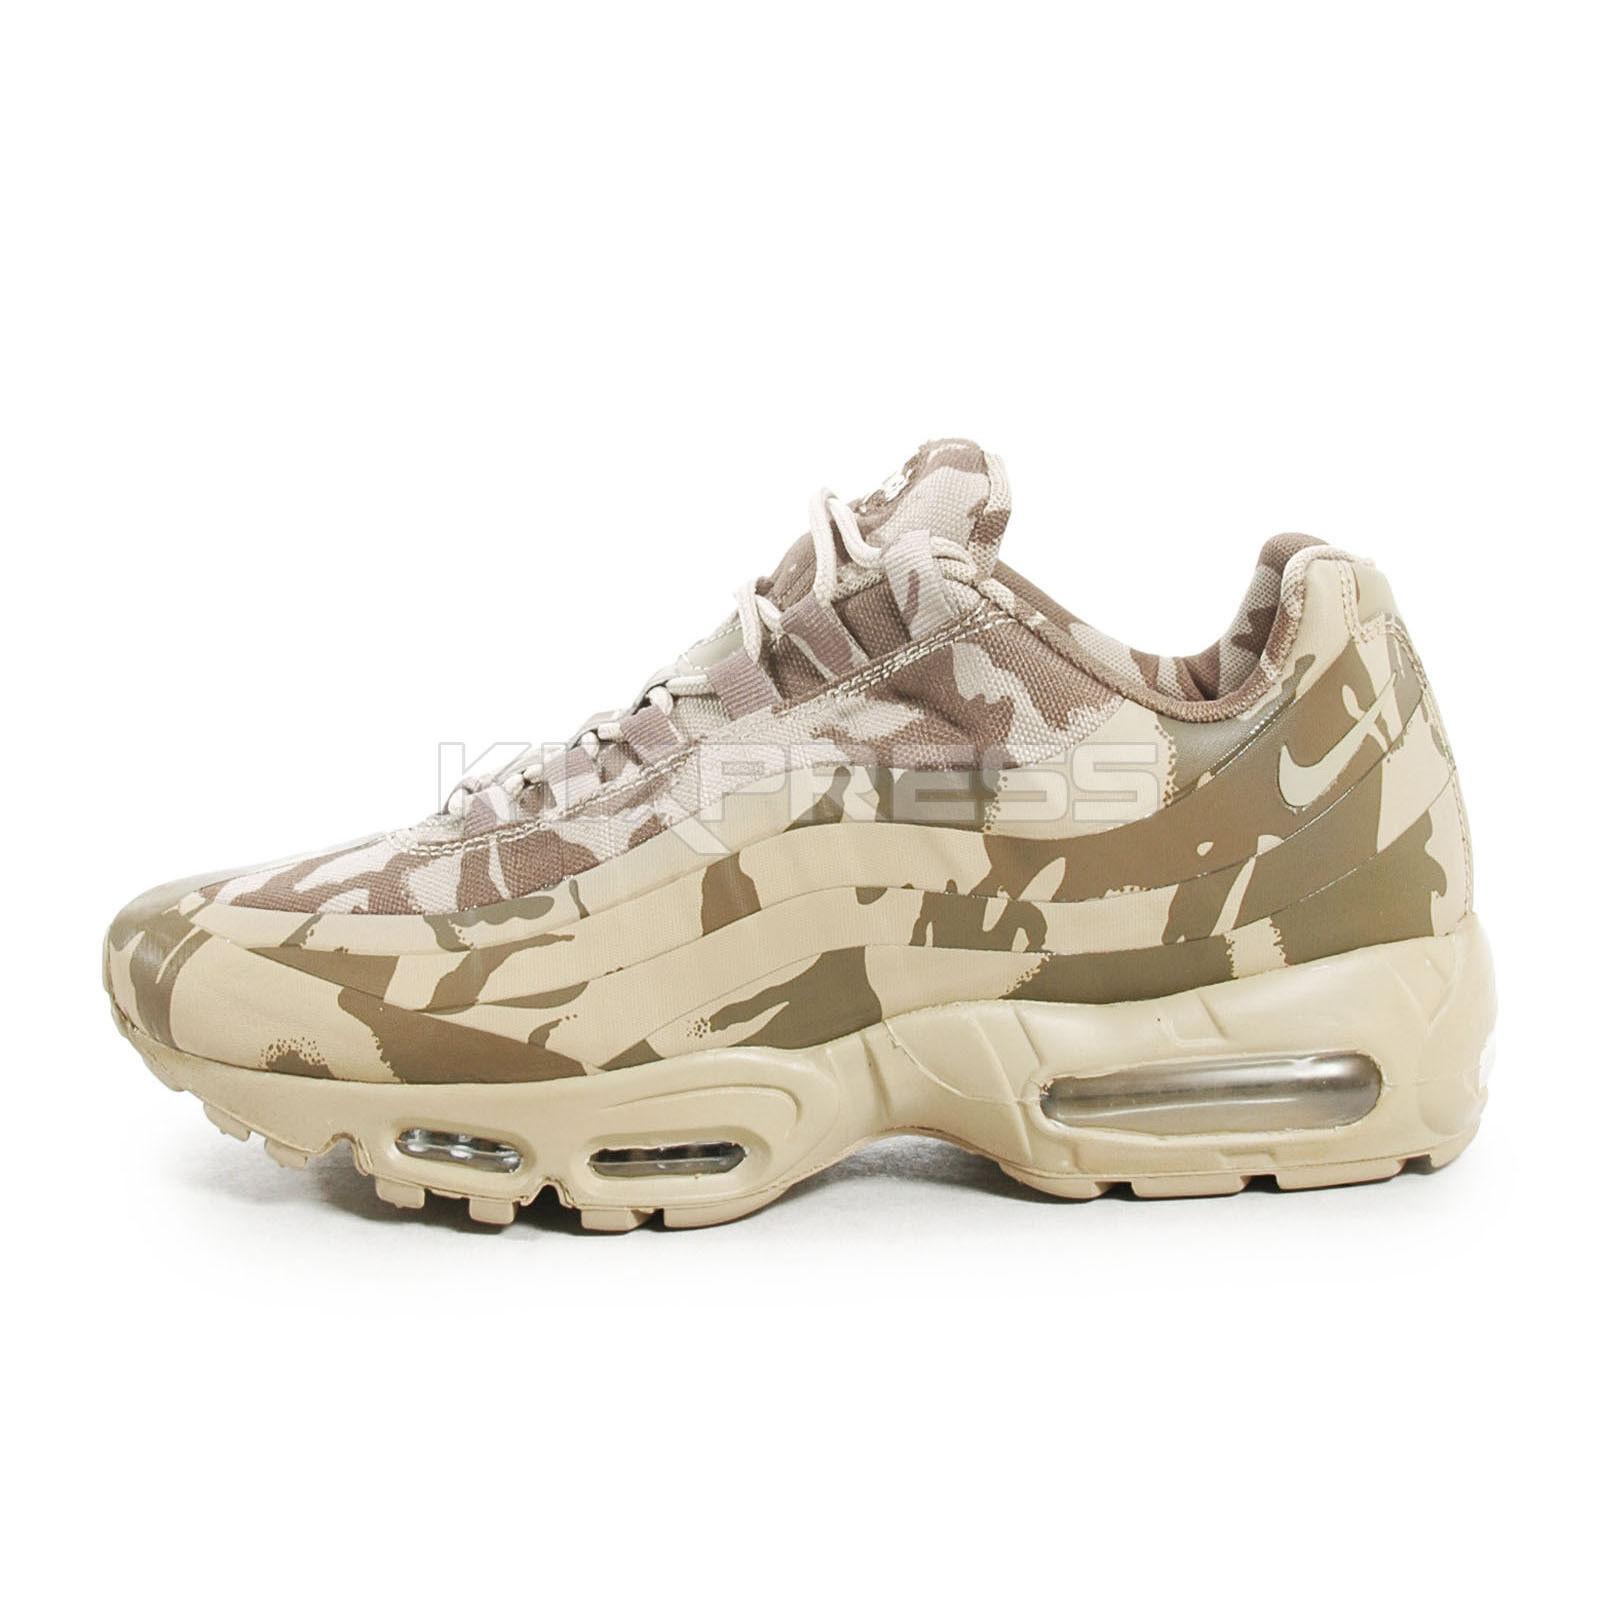 cheaper 2981b 57253 ... Hemp/Military Brown. free shipping Nike Air Max 95 UK SP [634773-220]  NSW Running Camo